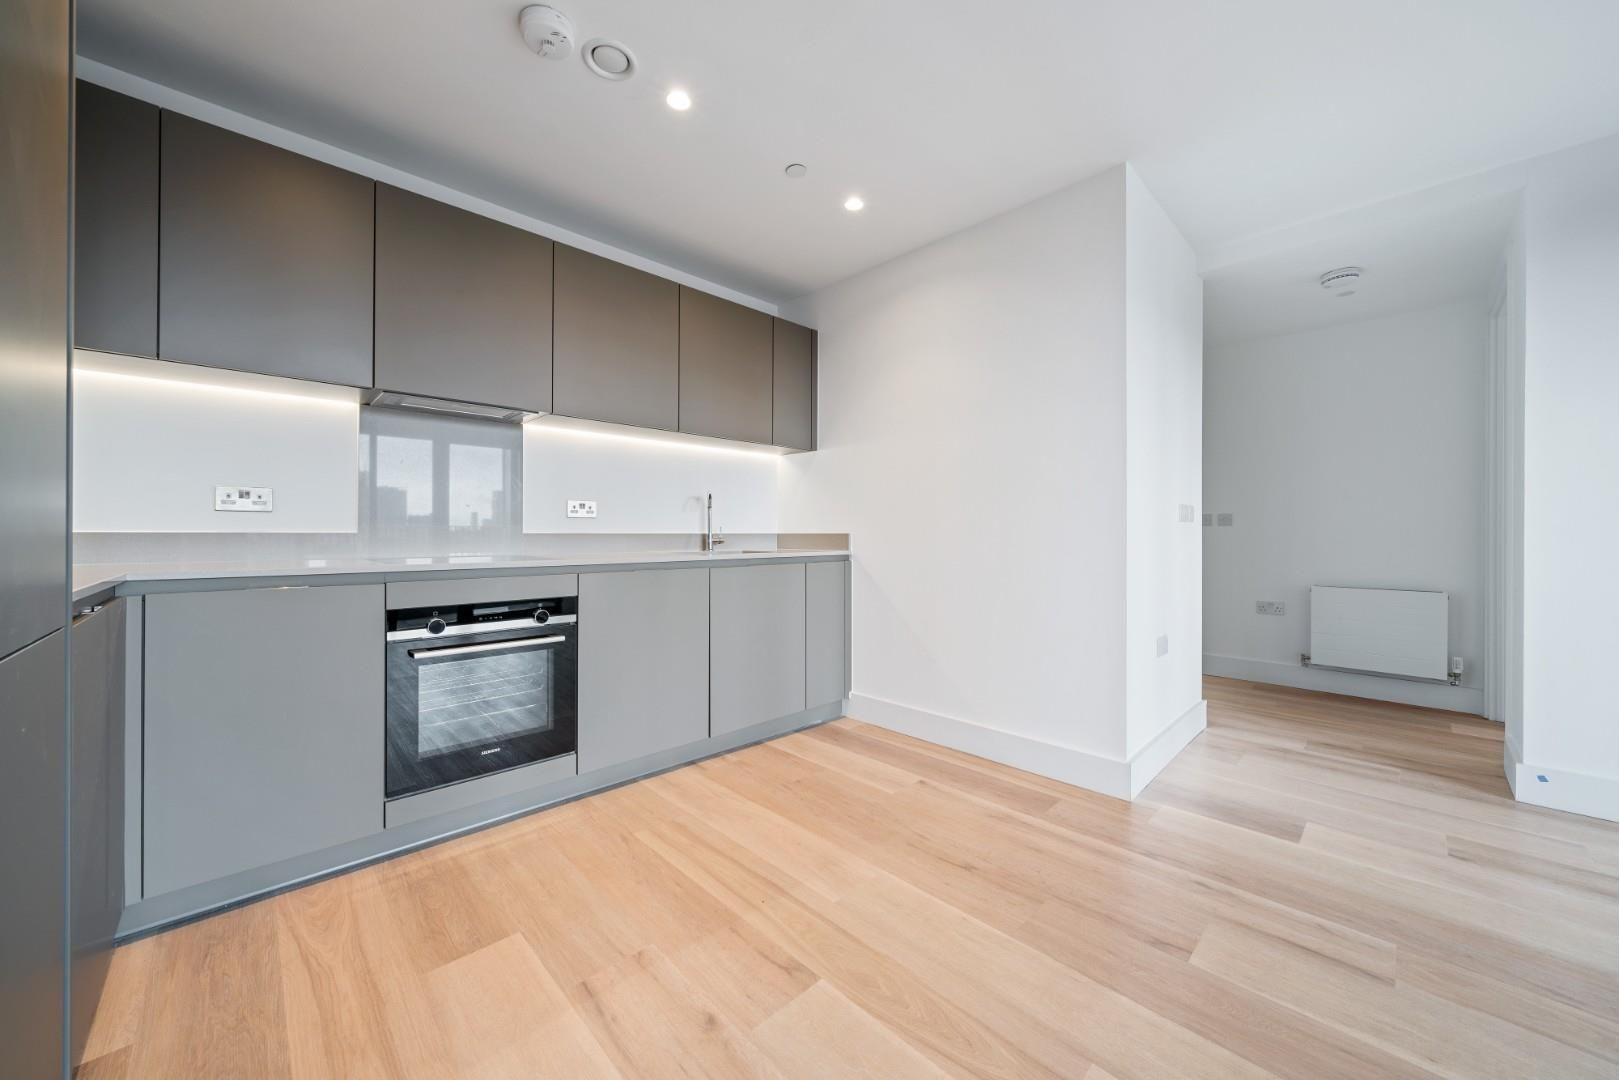 Property photo 1 of 14. Flat 13, Malt House E15 2Sr-No Watermark-9.Jpg